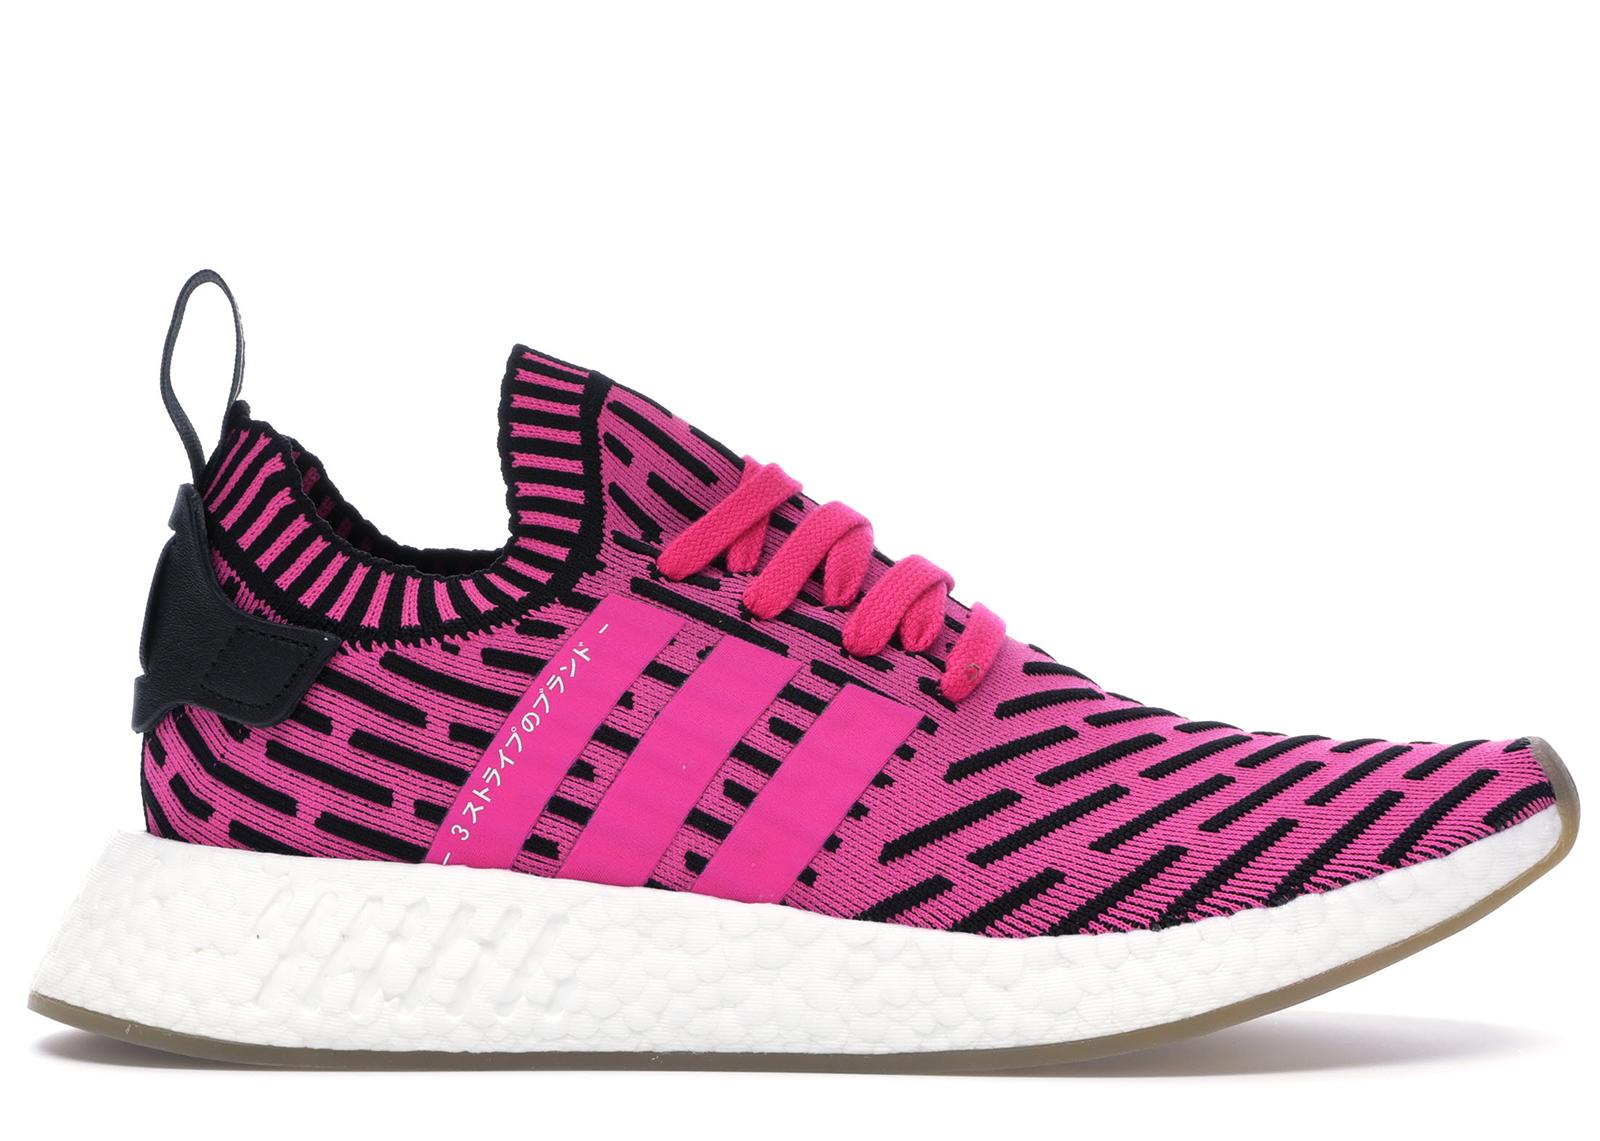 Adidas NMD_R2 Primeknit Japan Pack BY9697 Men's Shock Pink